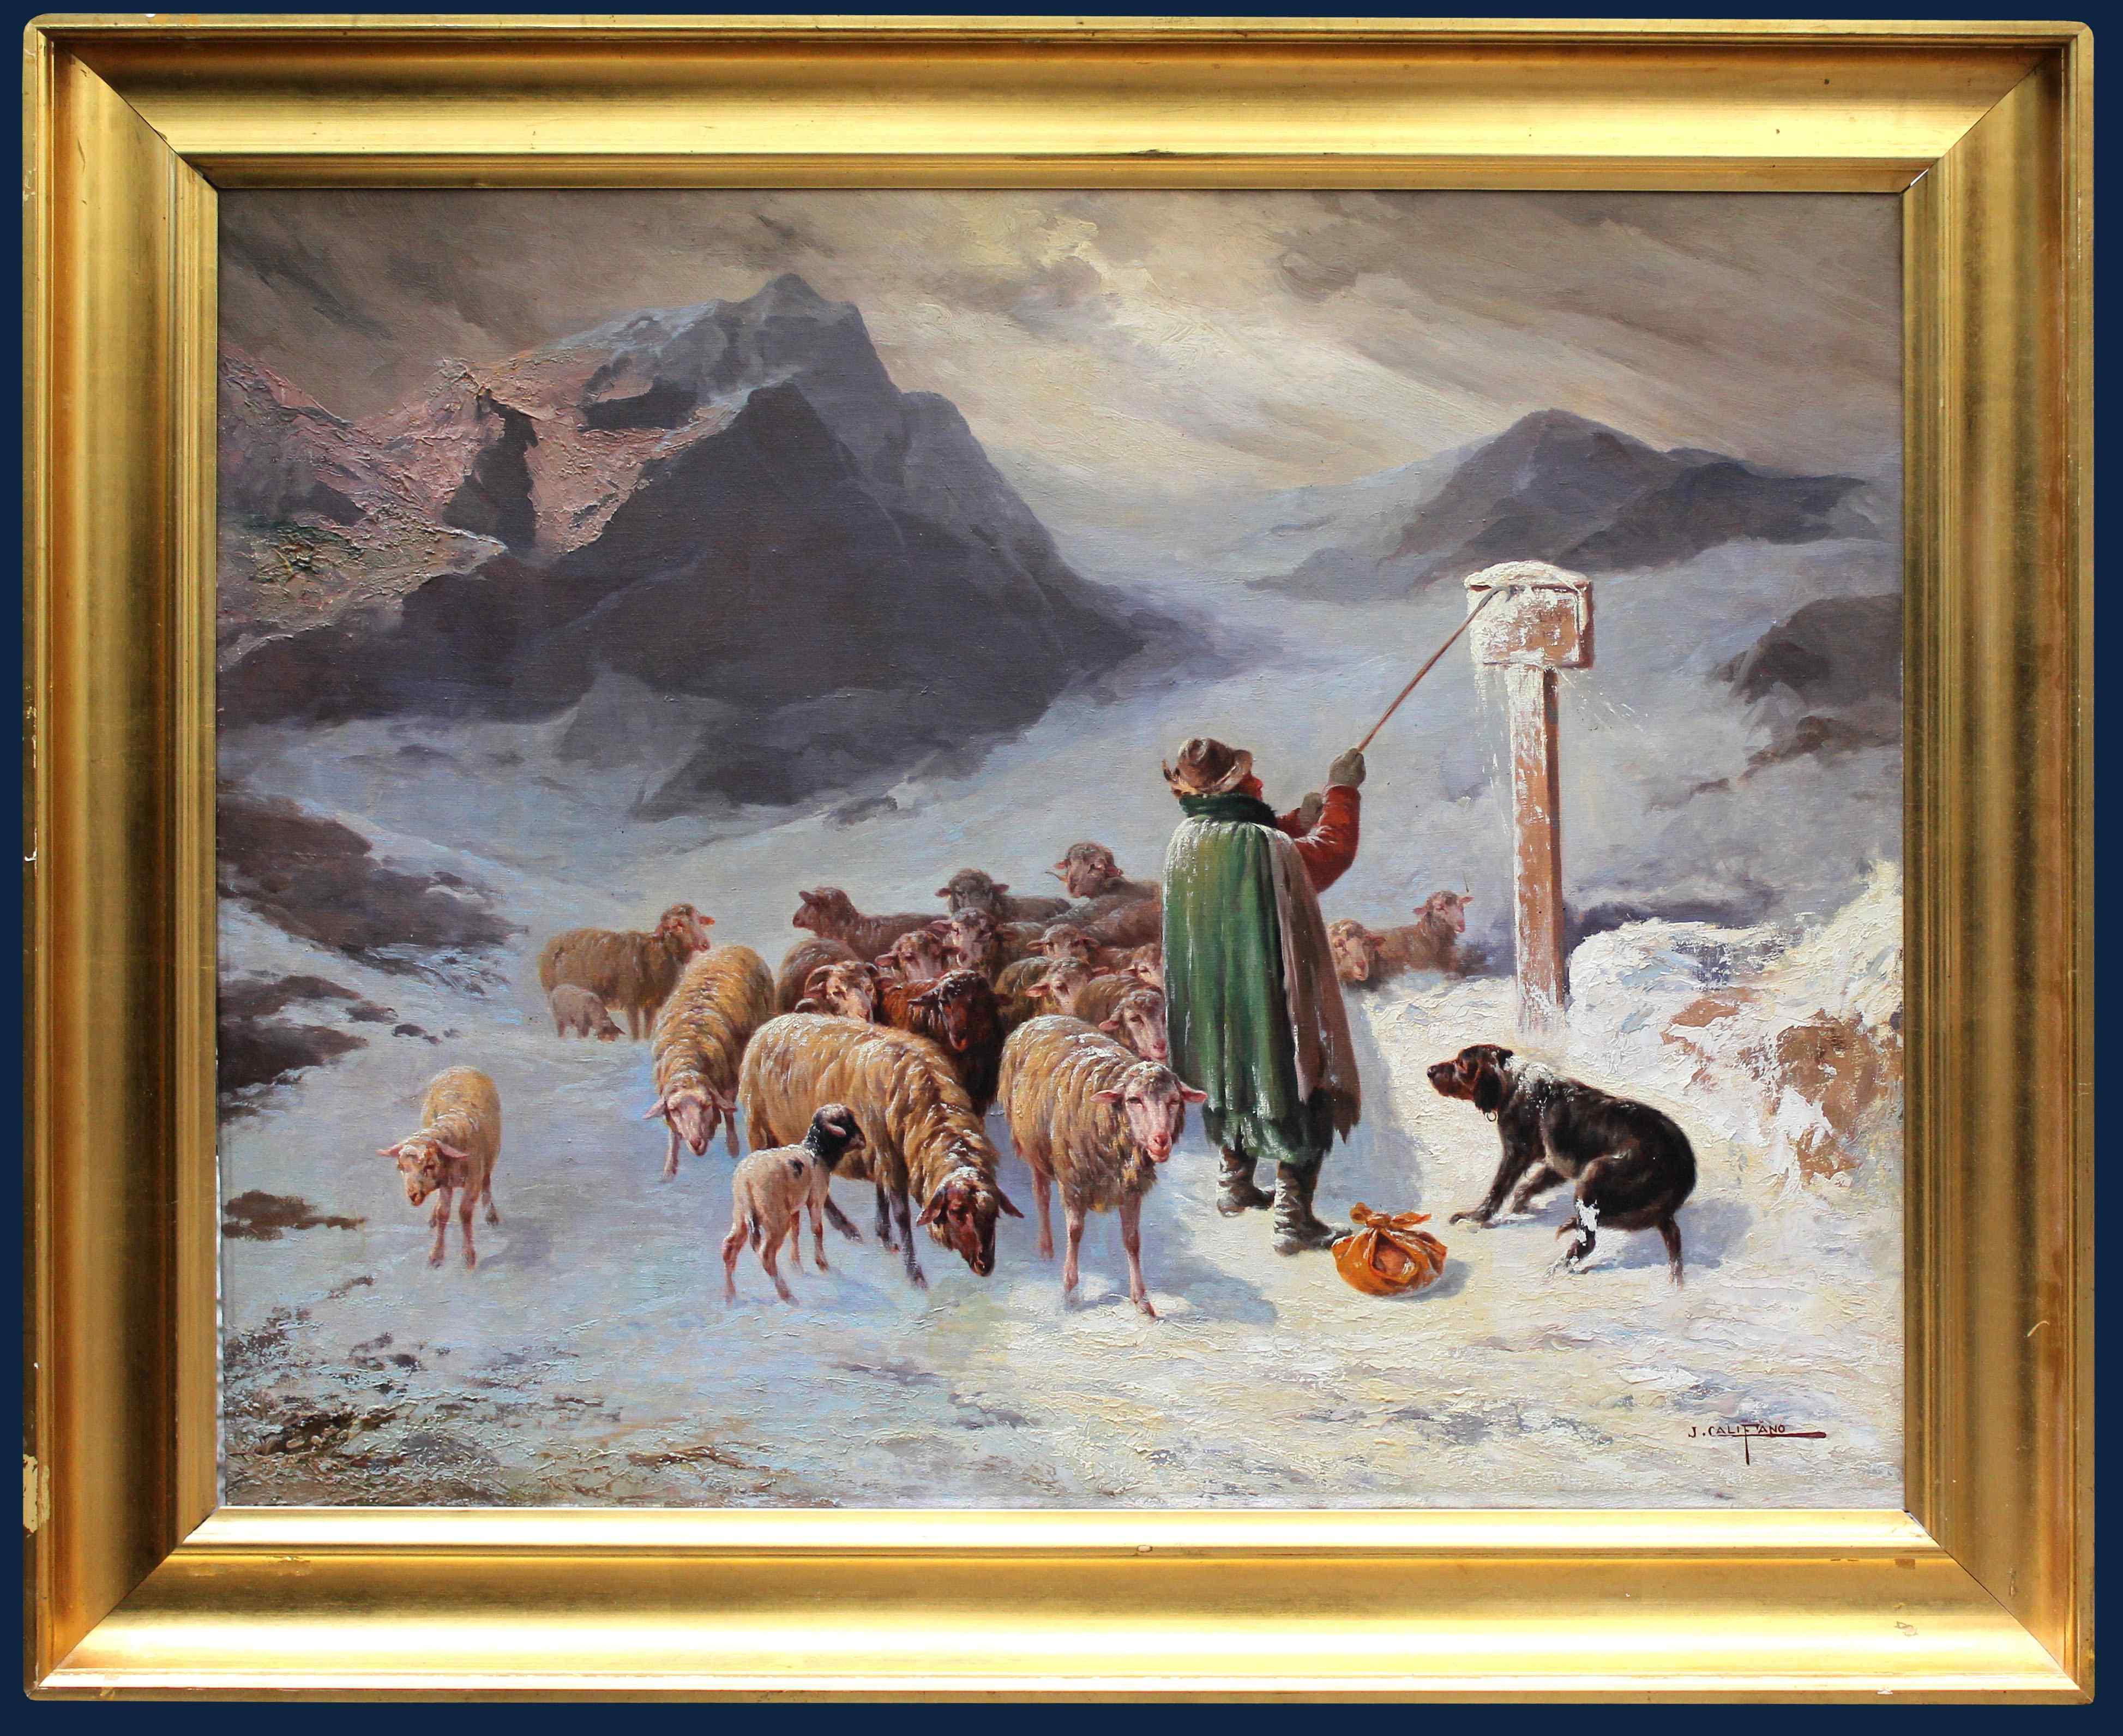 John Califano (Rome, 1864-Chicago, 1924), Mountainous landsc